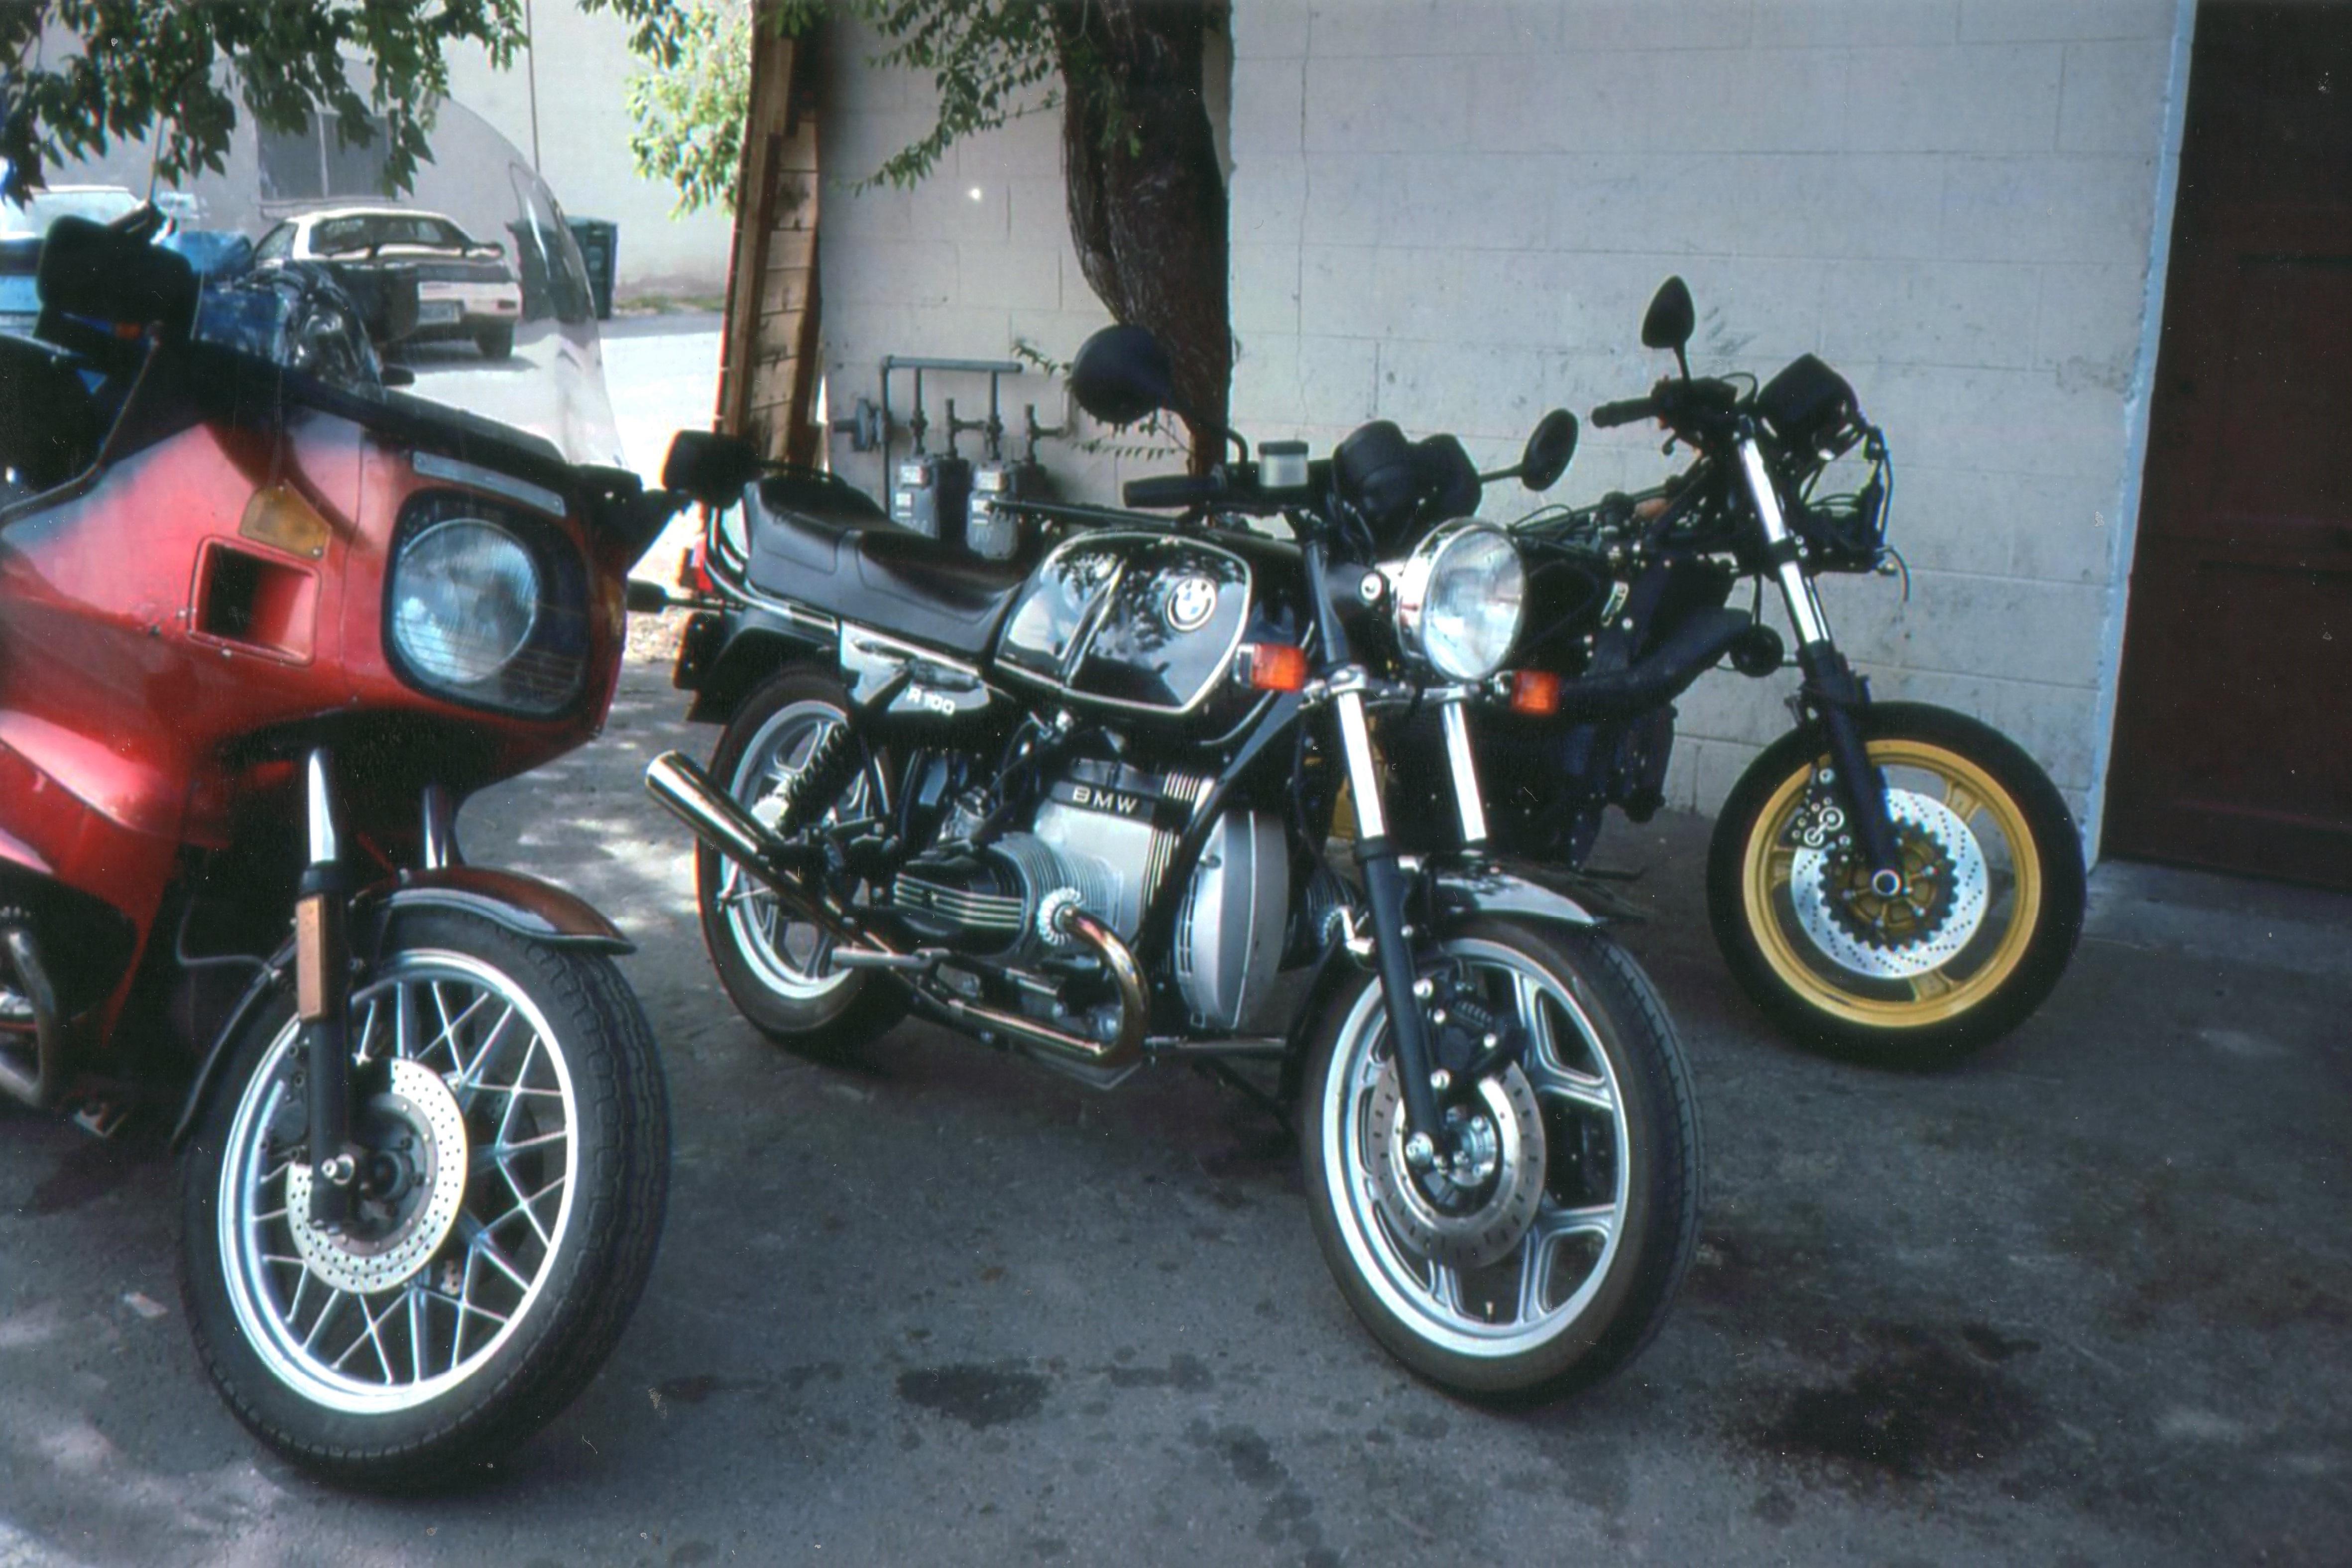 File Bmw R100 At Reno Bmw 1991 Jpg Wikimedia Commons